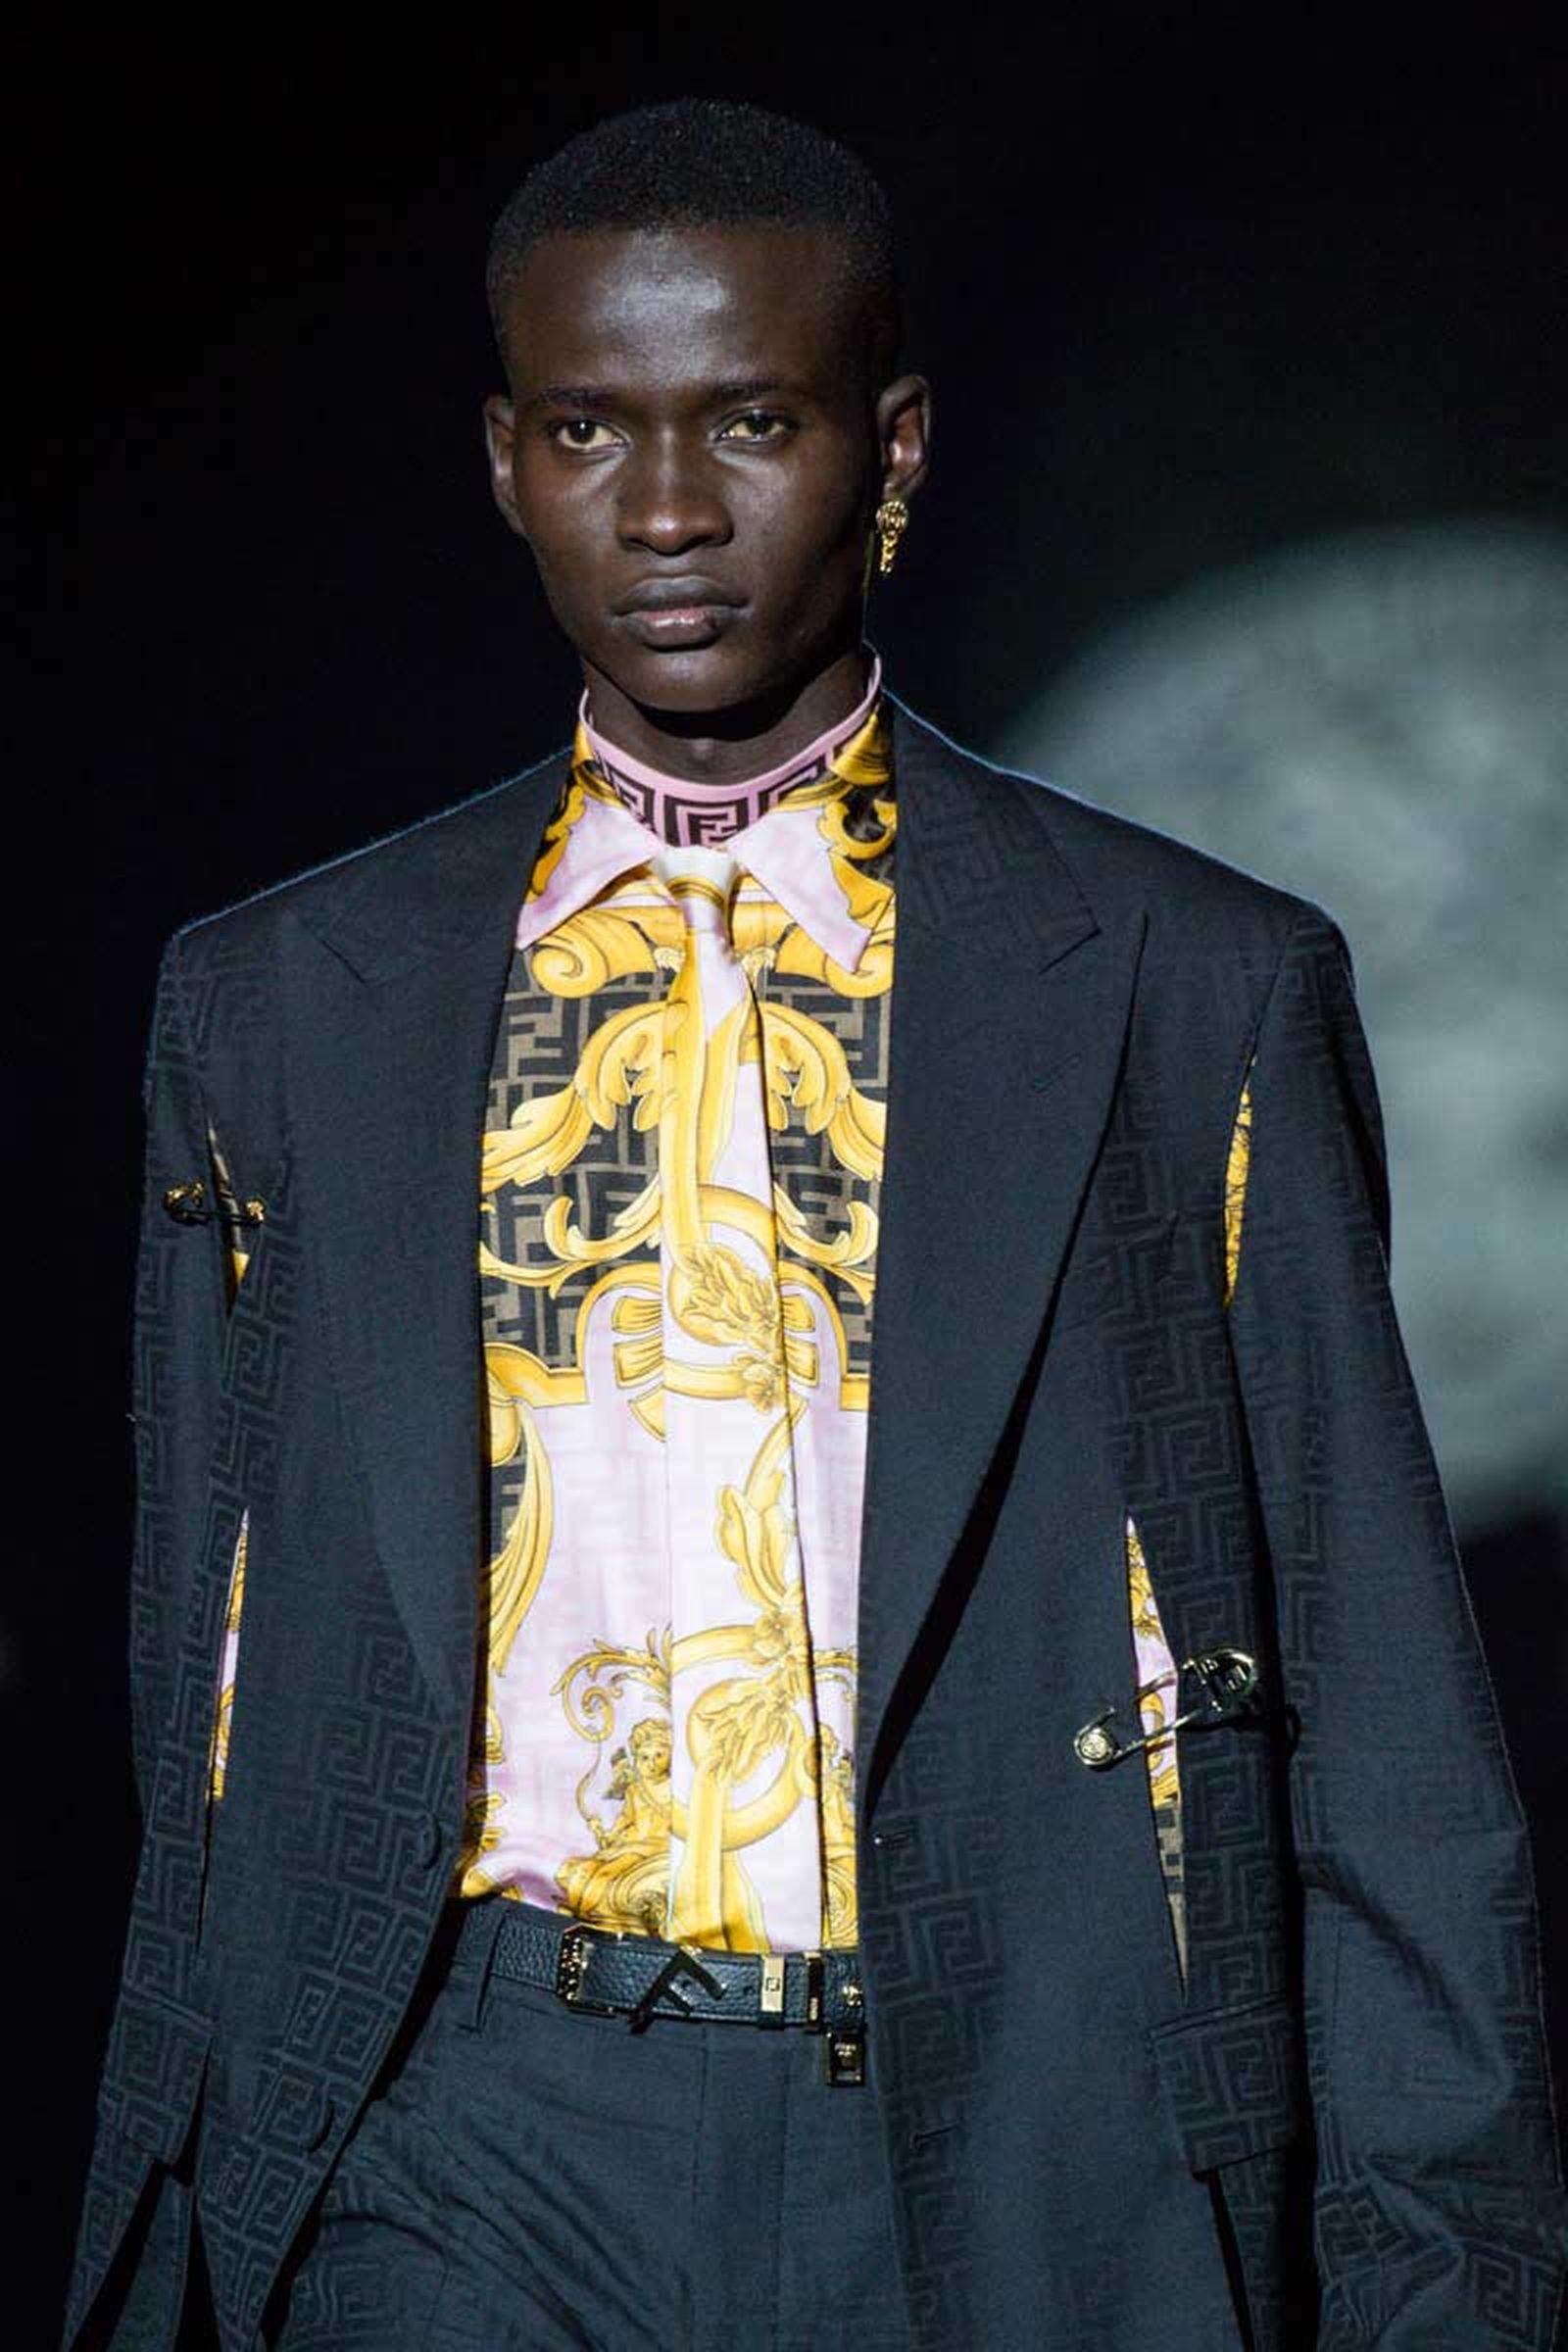 versace-fendi-collab--(59)